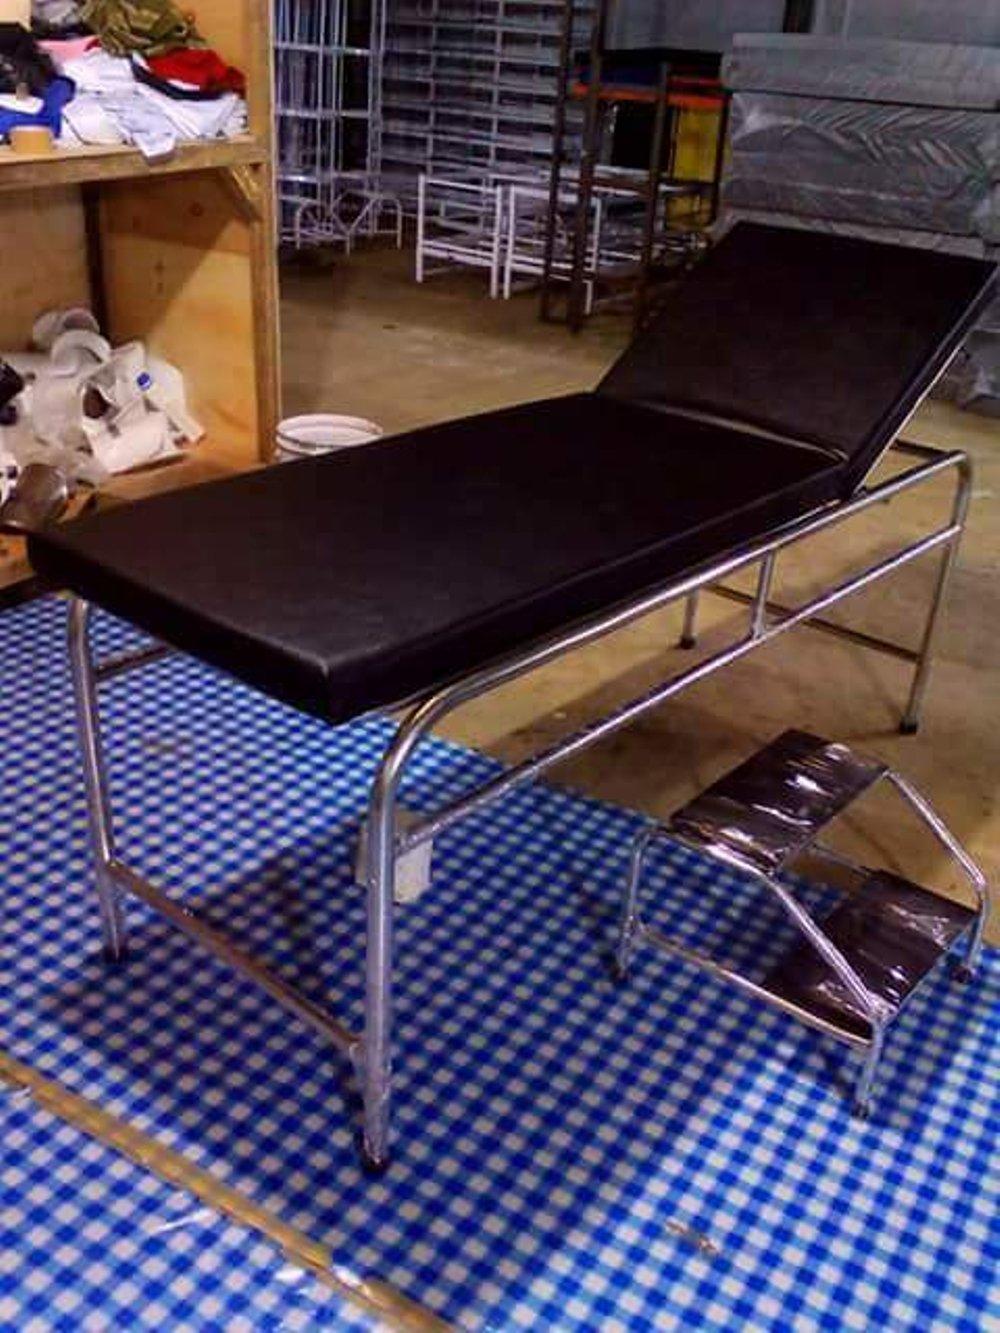 ranjang tempat tidur pasien bahan stainless